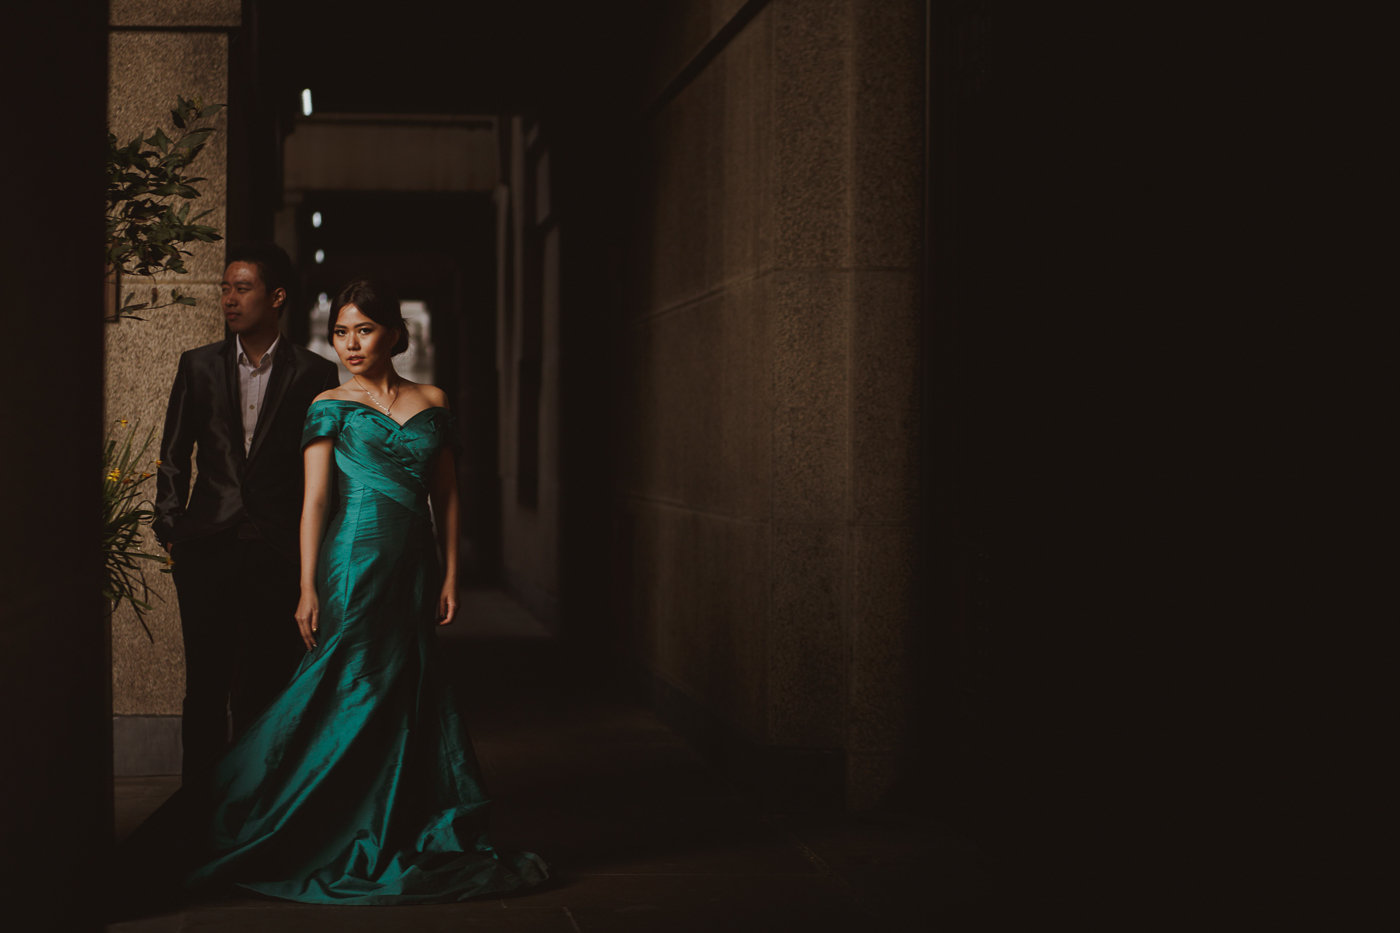 pre-wedding-photography-london-21.jpg